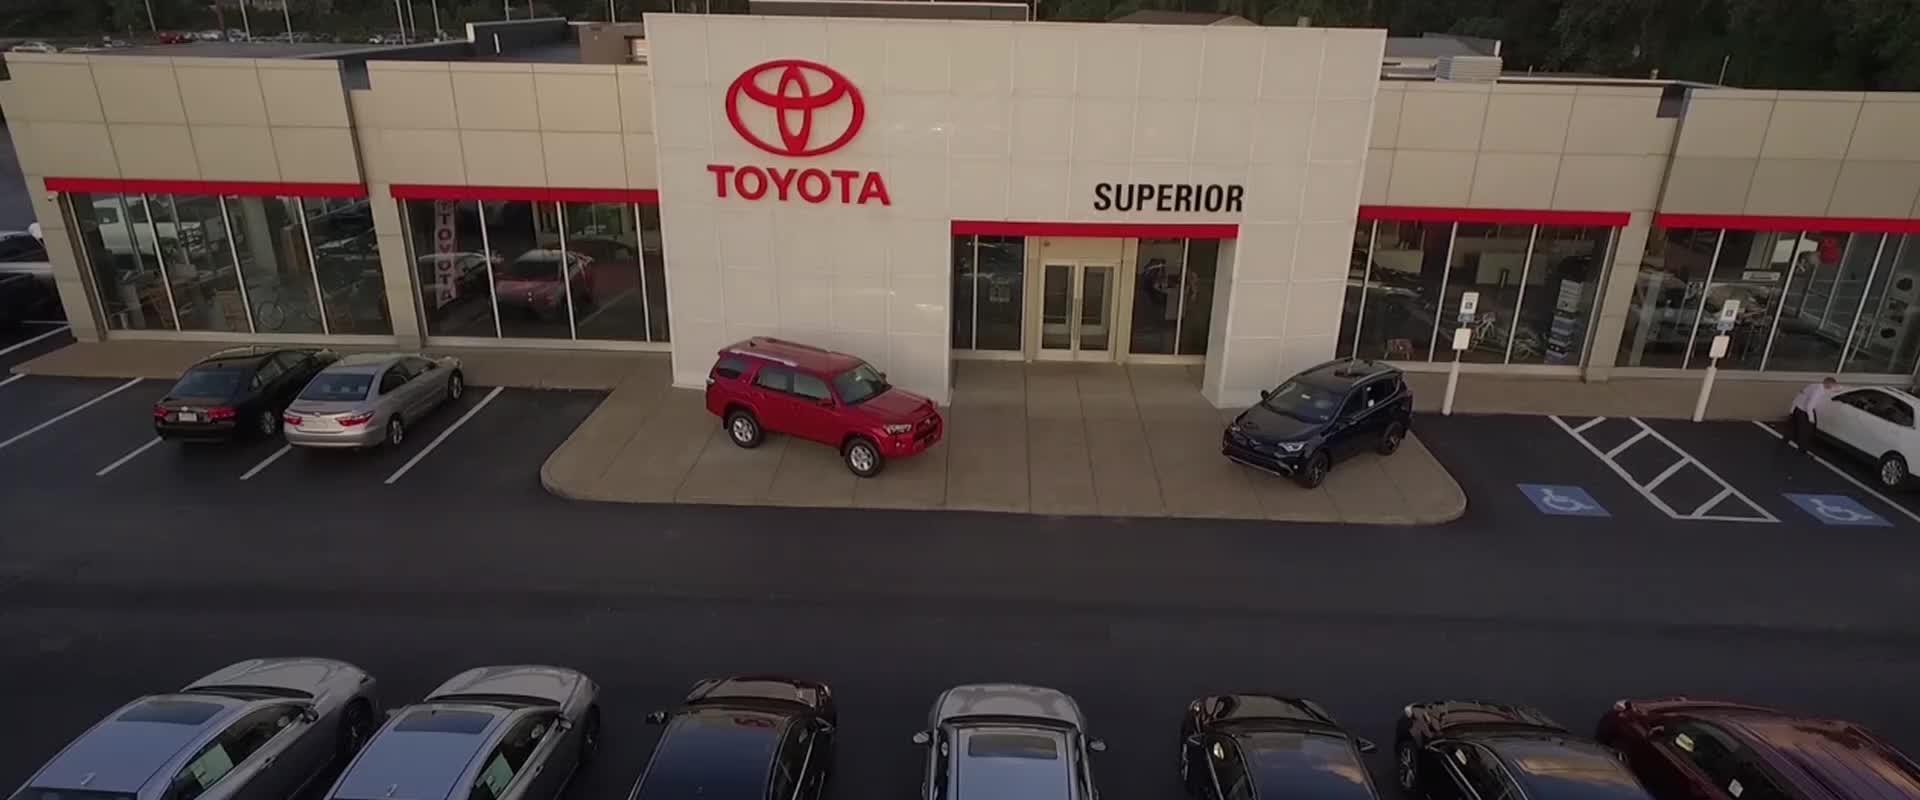 Toyota Dealer Erie Pa New Used Cars For Sale Near Ashtabula Oh